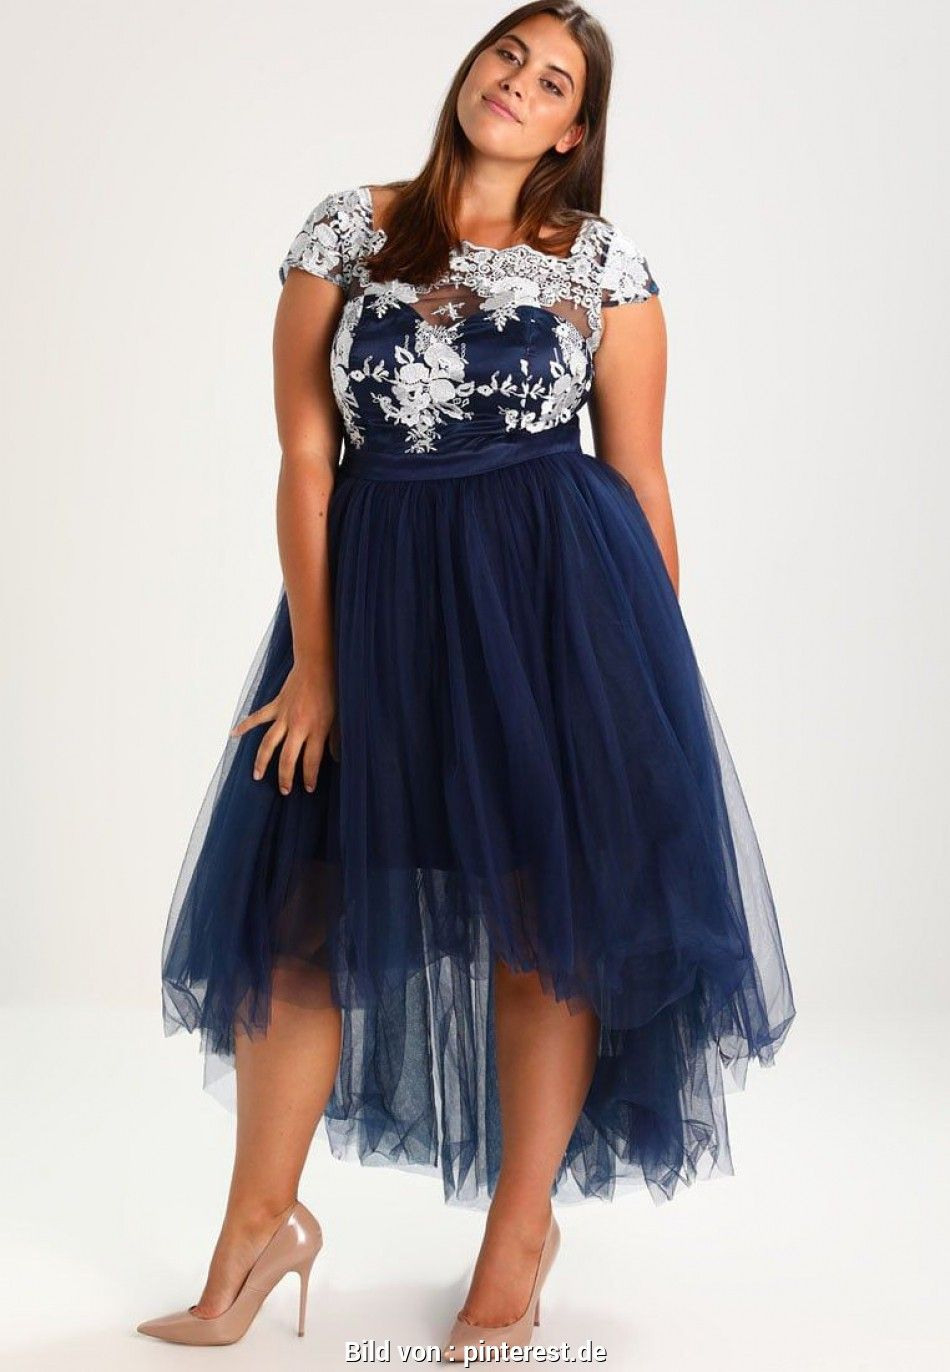 20 Kreativ Abendkleider Plus Size Spezialgebiet Kreativ Abendkleider Plus Size Design